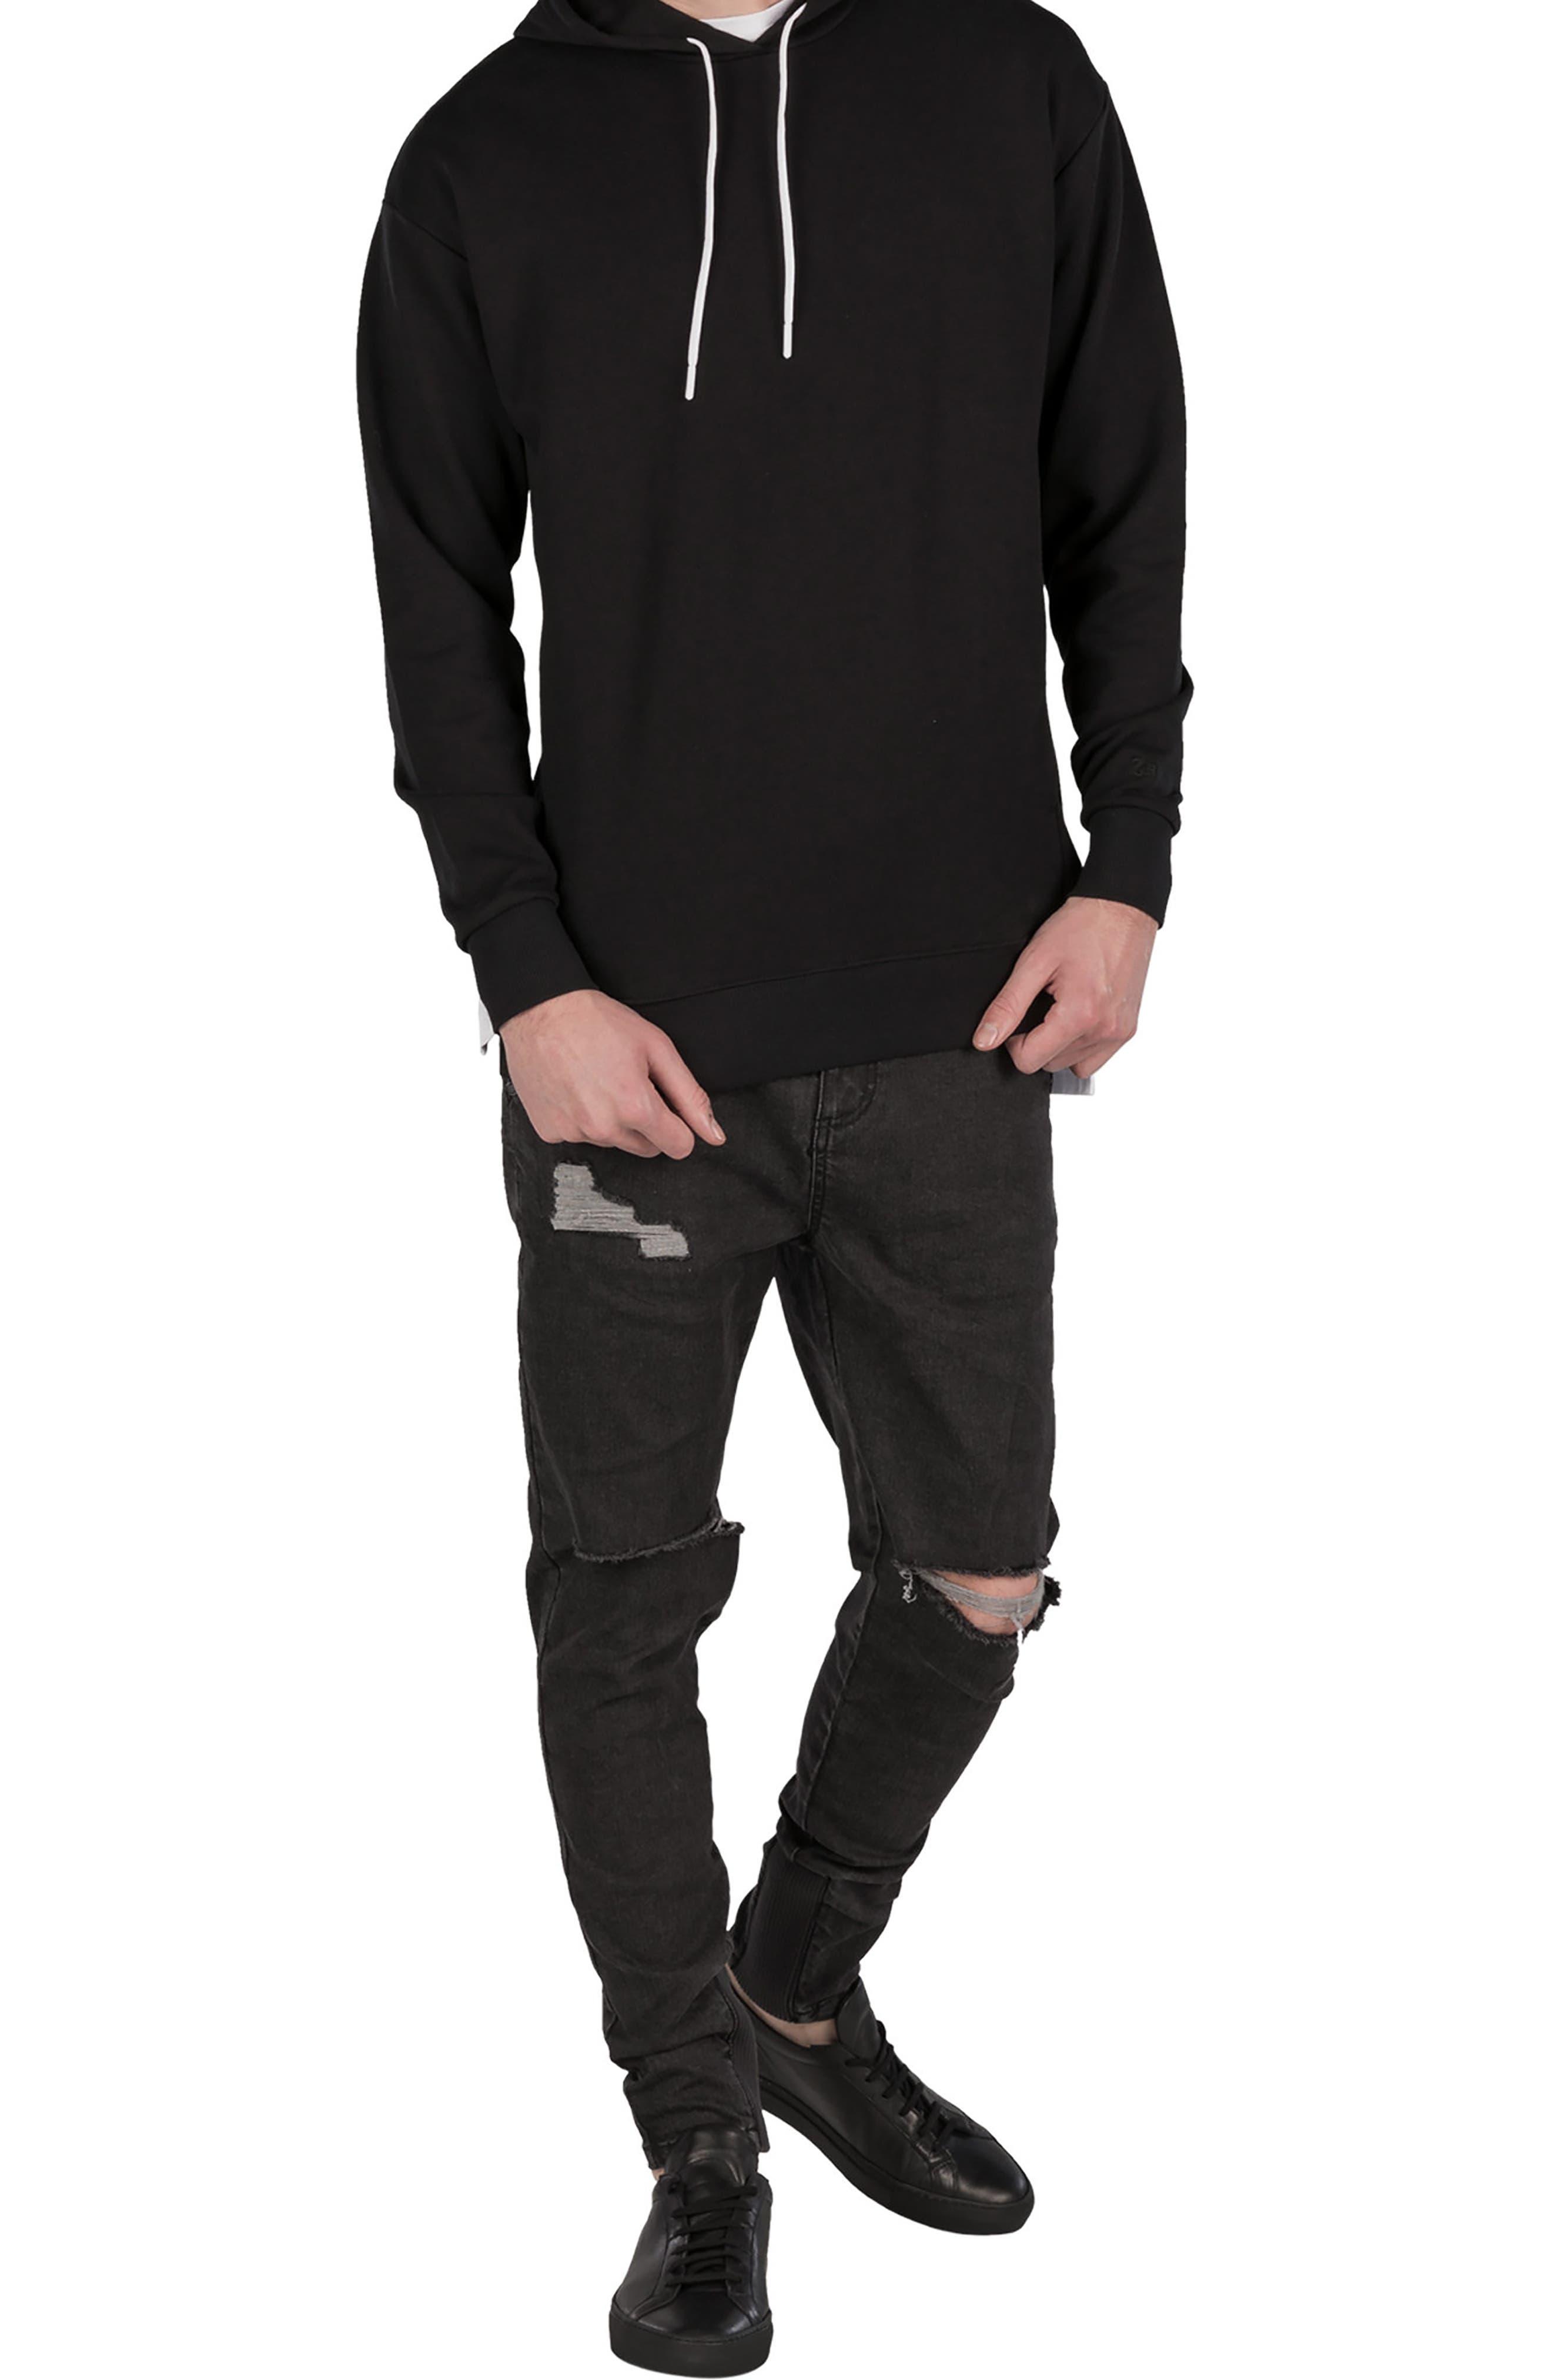 Rugger Hooded Sweatshirt,                             Alternate thumbnail 4, color,                             BLACK